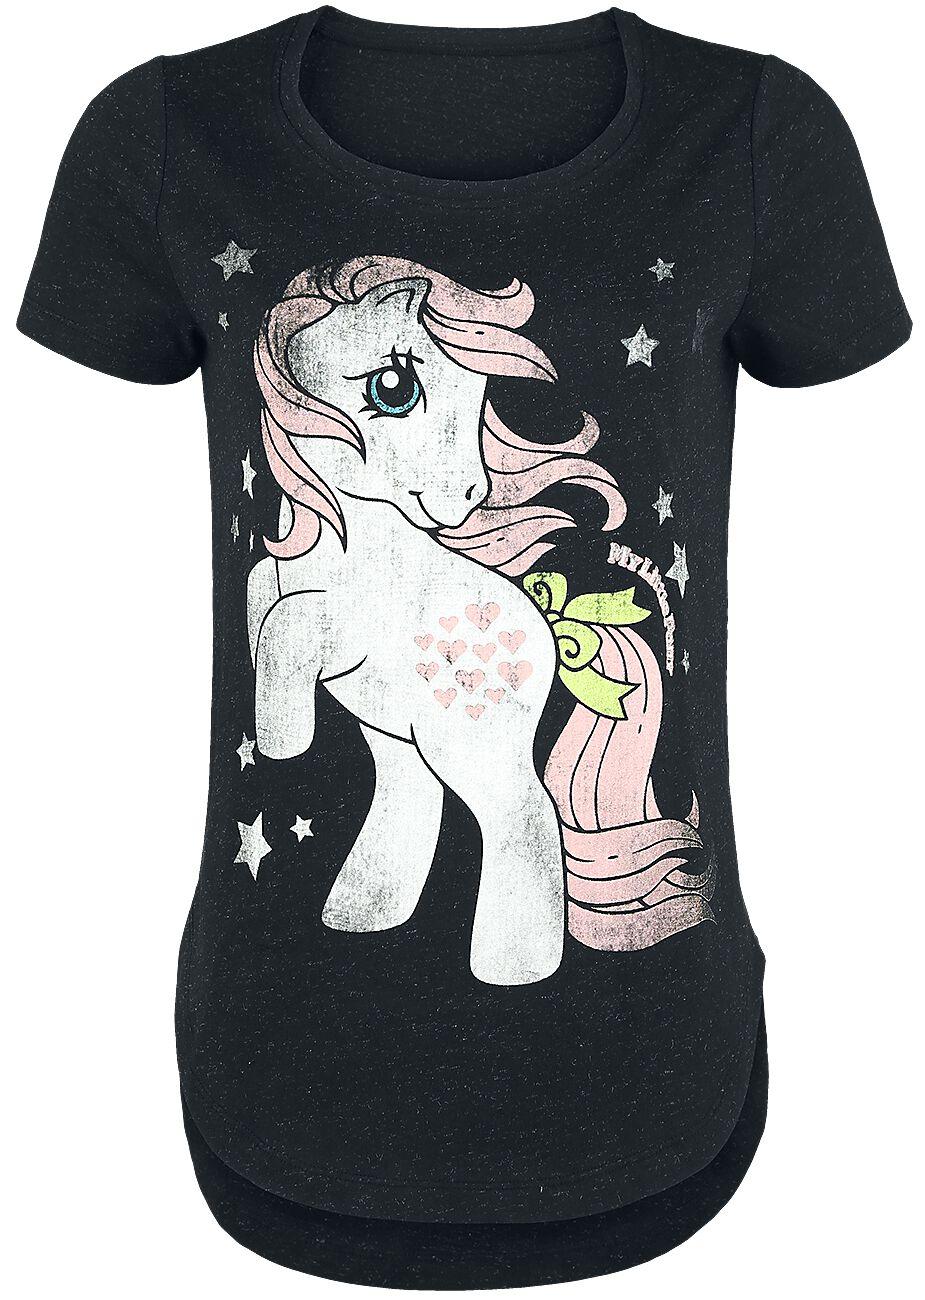 My Little Pony Stars Girl-Shirt schwarz meliert